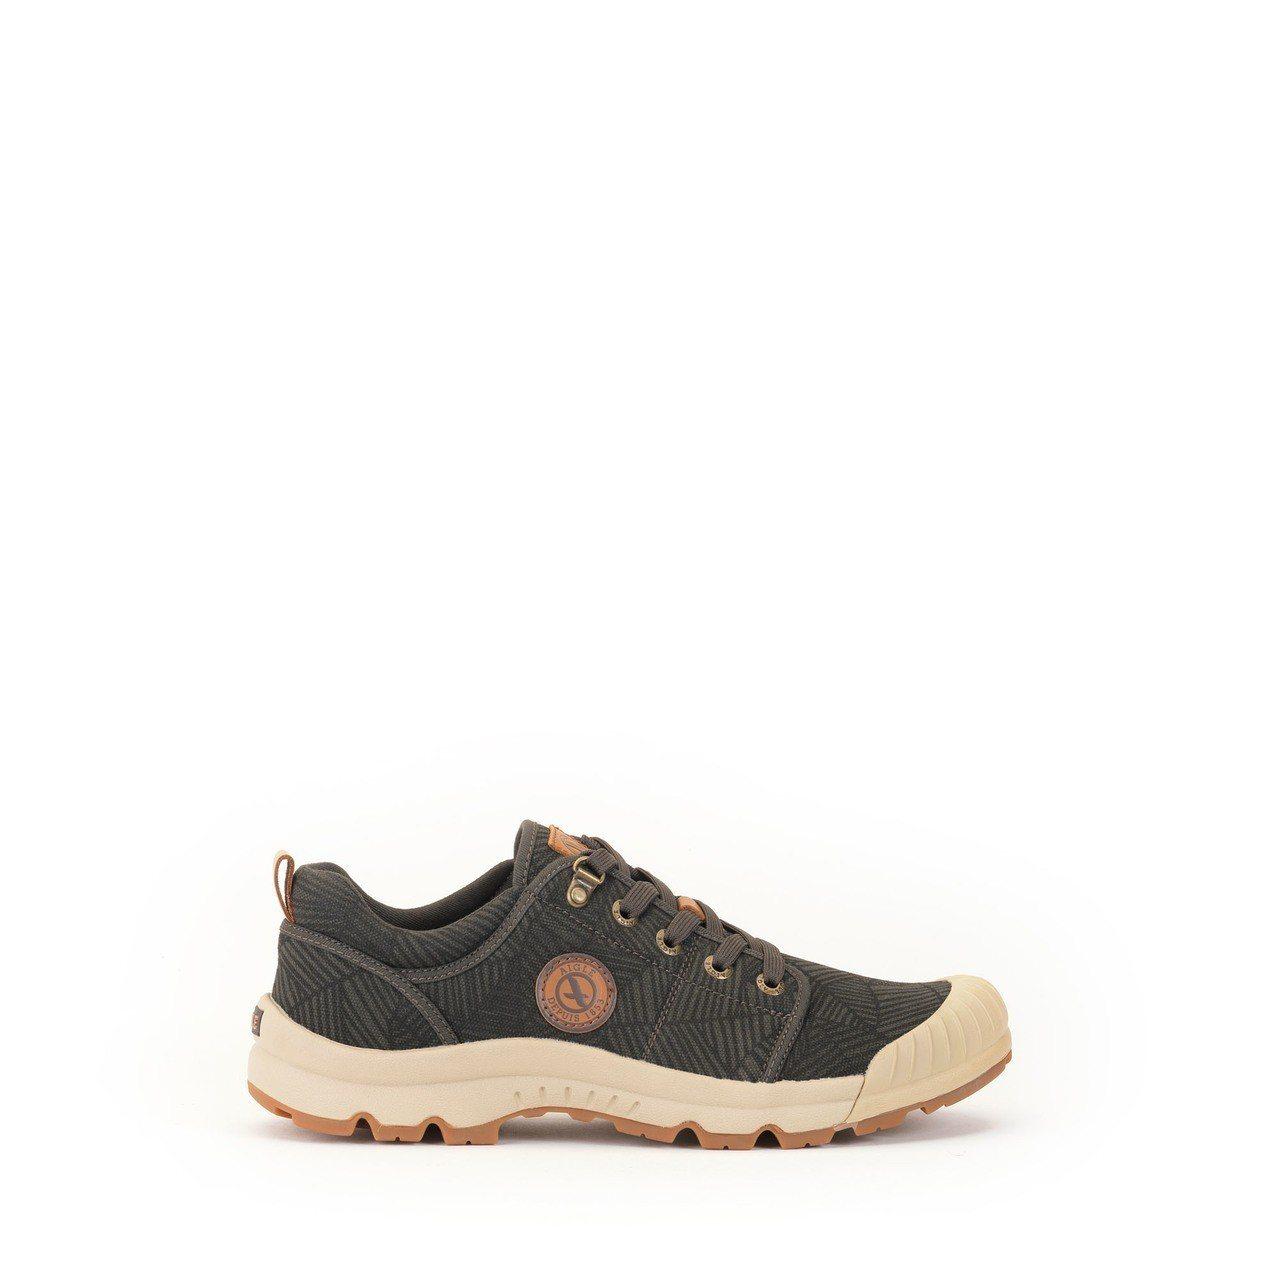 Aigle男款輕量低筒健行鞋,約4,800元。圖/Aigle提供